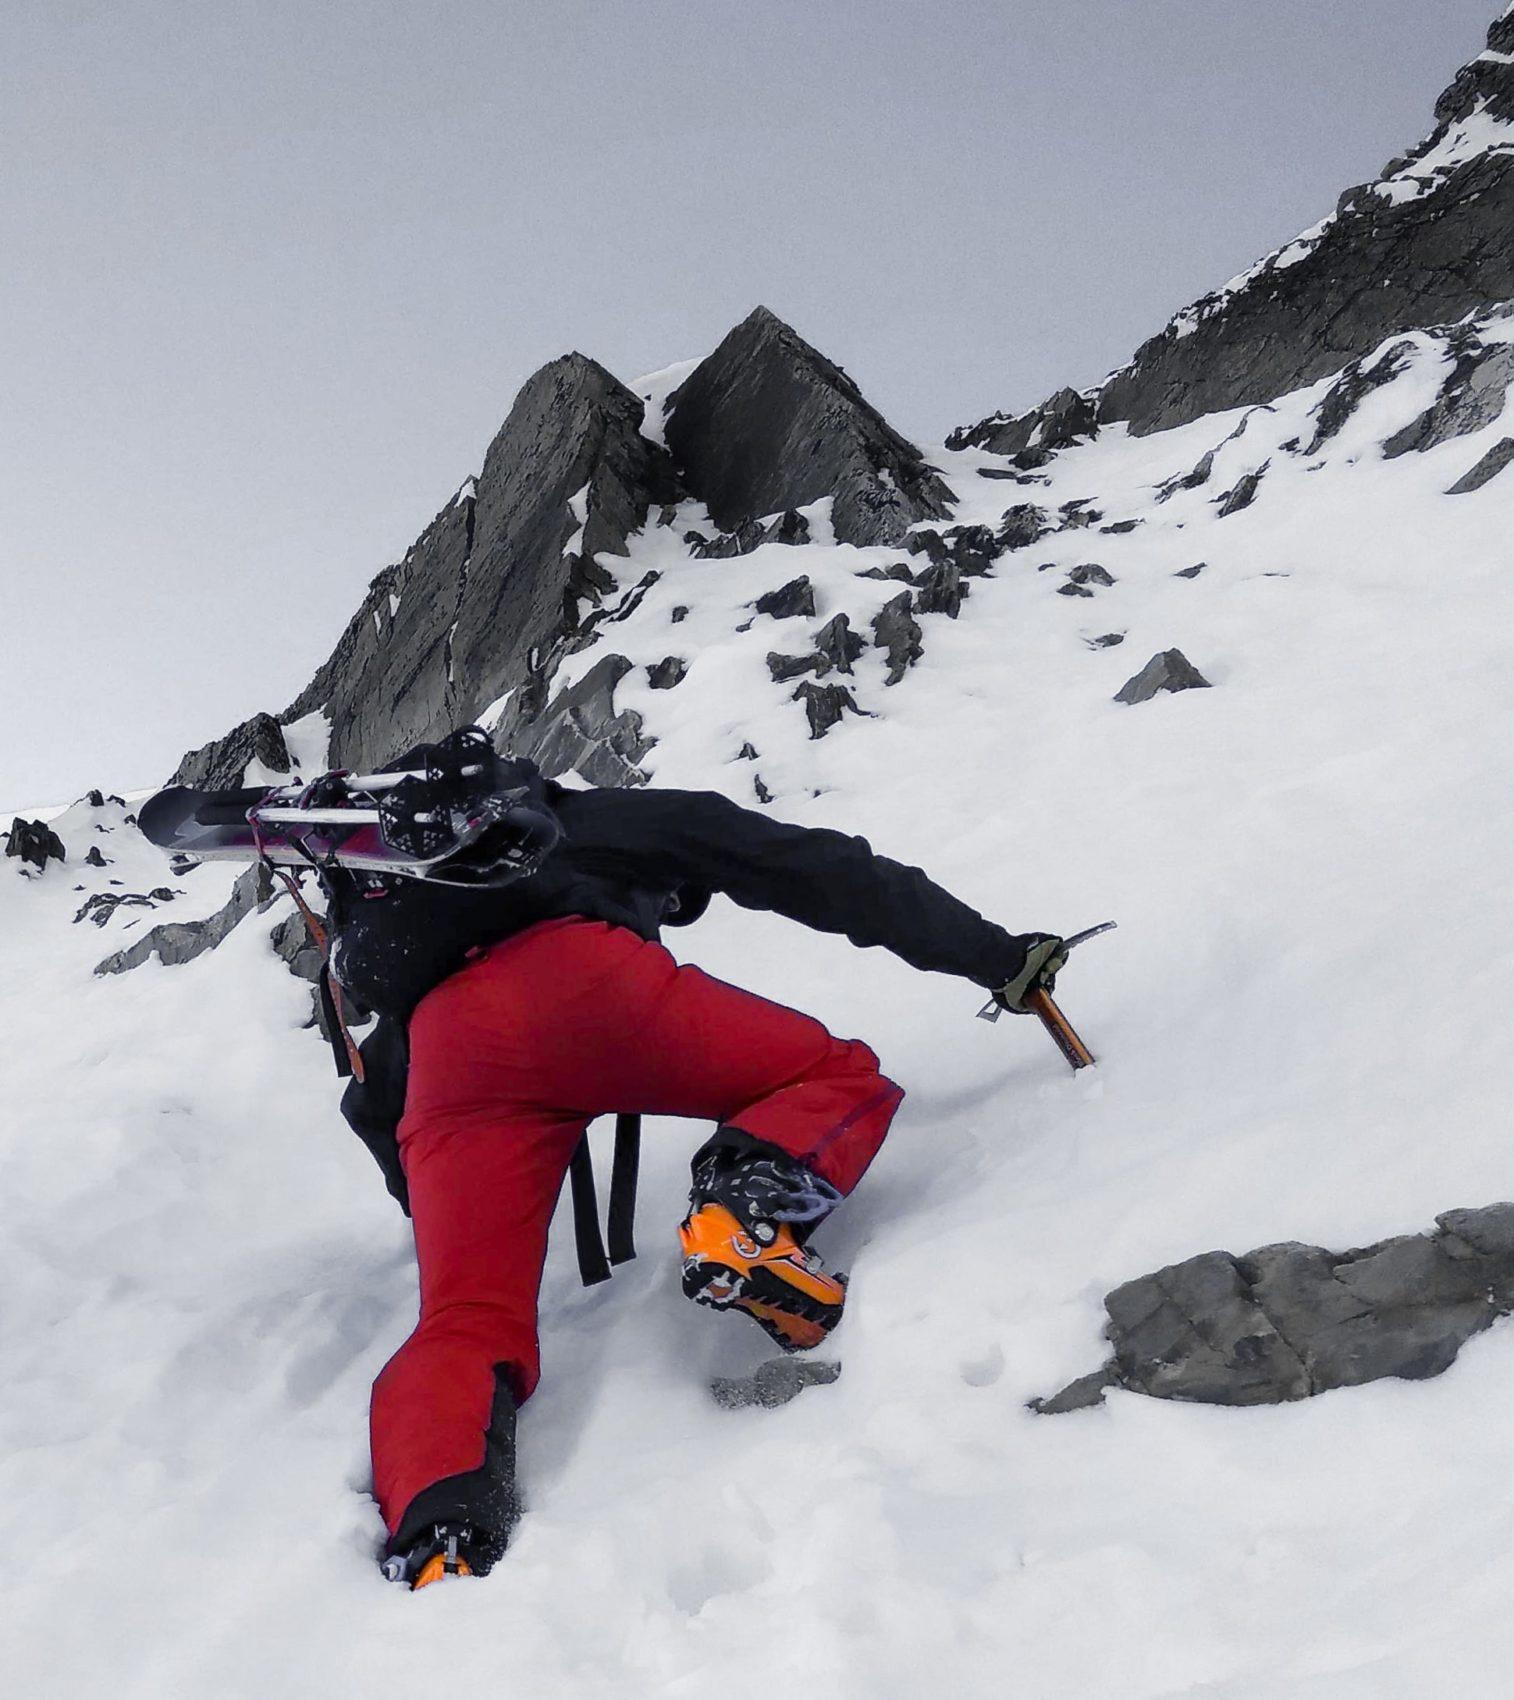 ski mountaineer climbing Ross Pass